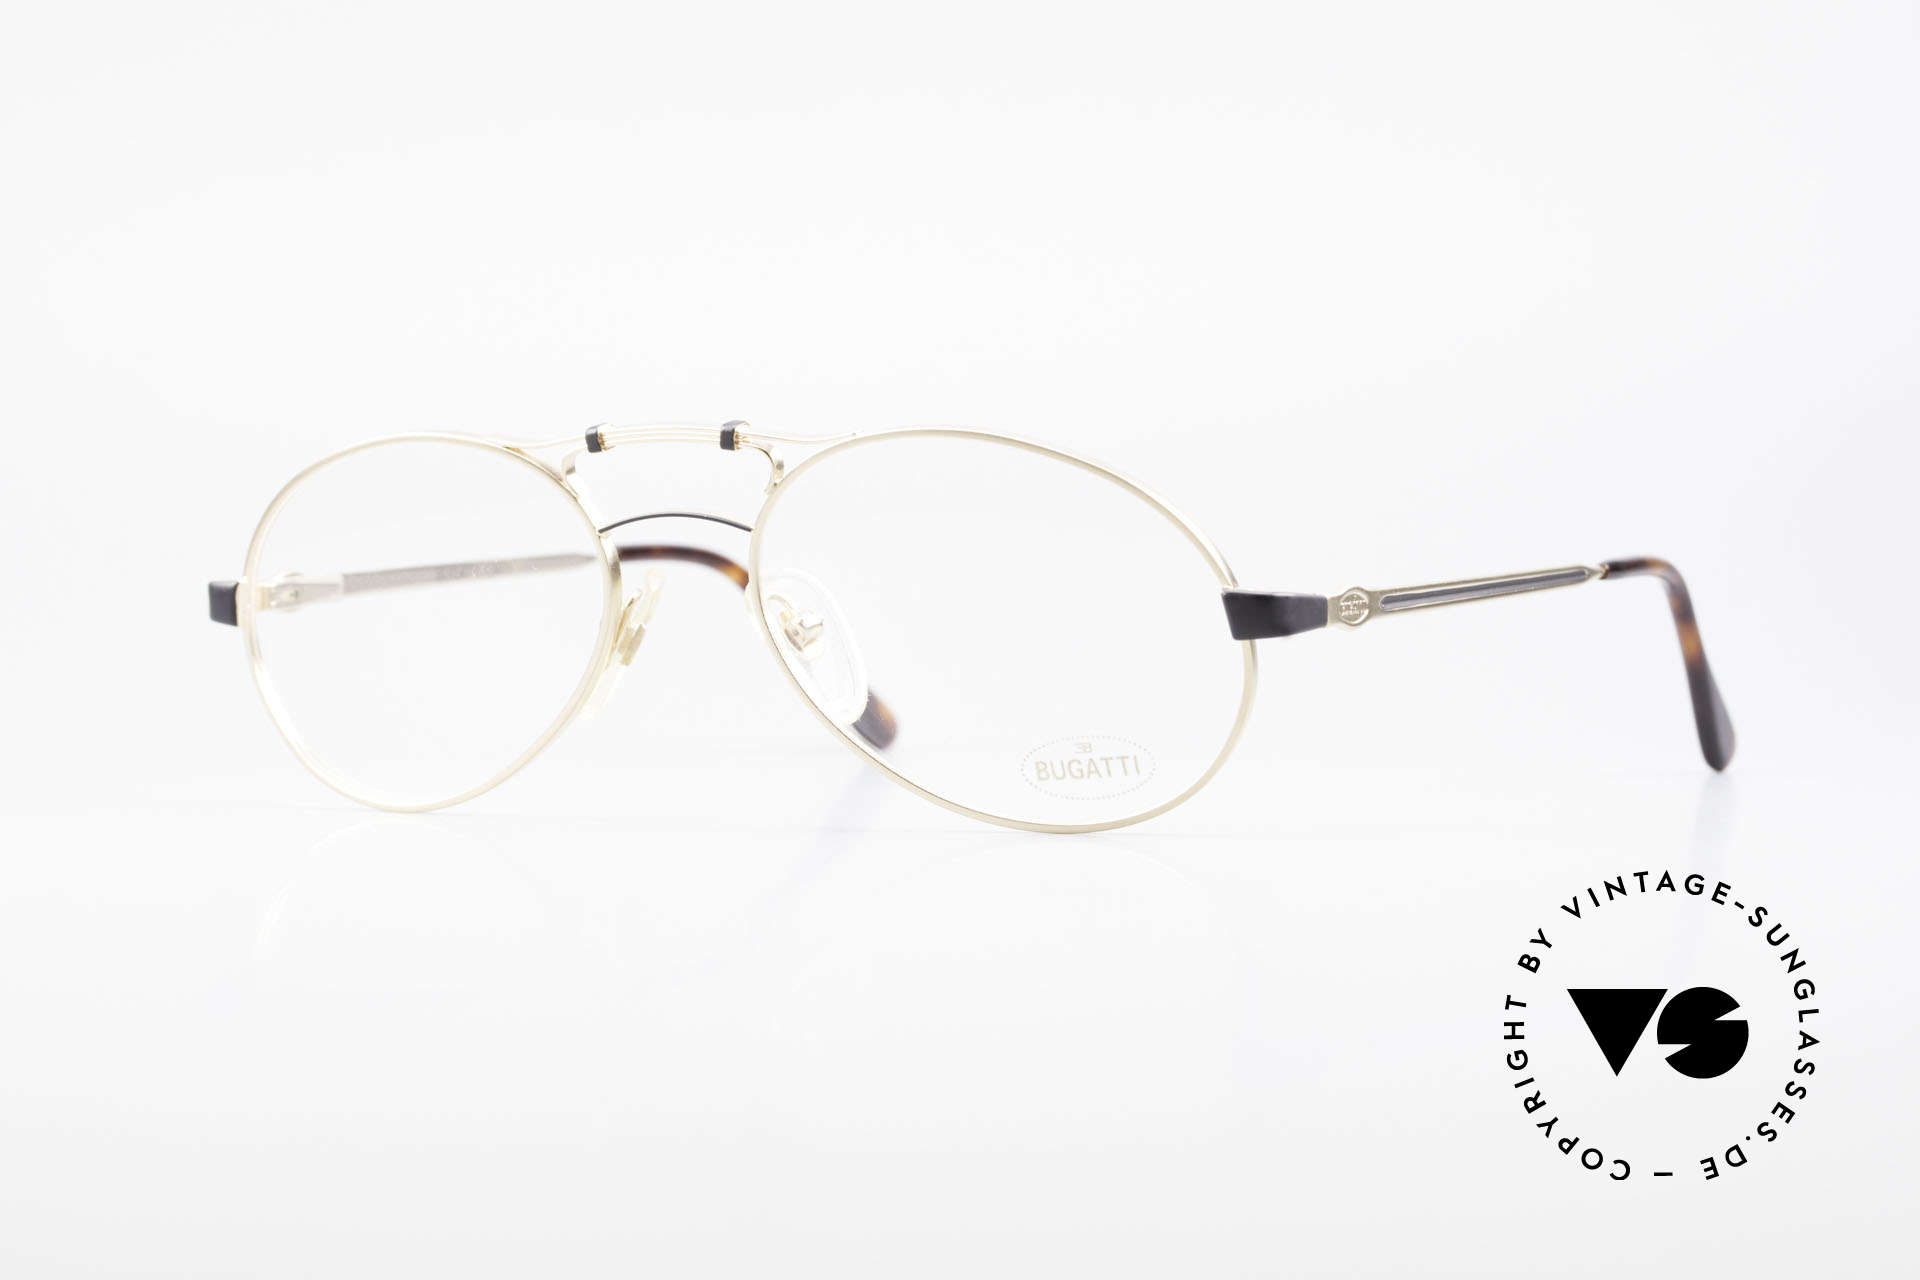 Bugatti 13411 Vintage Men's Eyeglass Frame, antique appearing vintage 90's eyeglasses by Bugatti, Made for Men